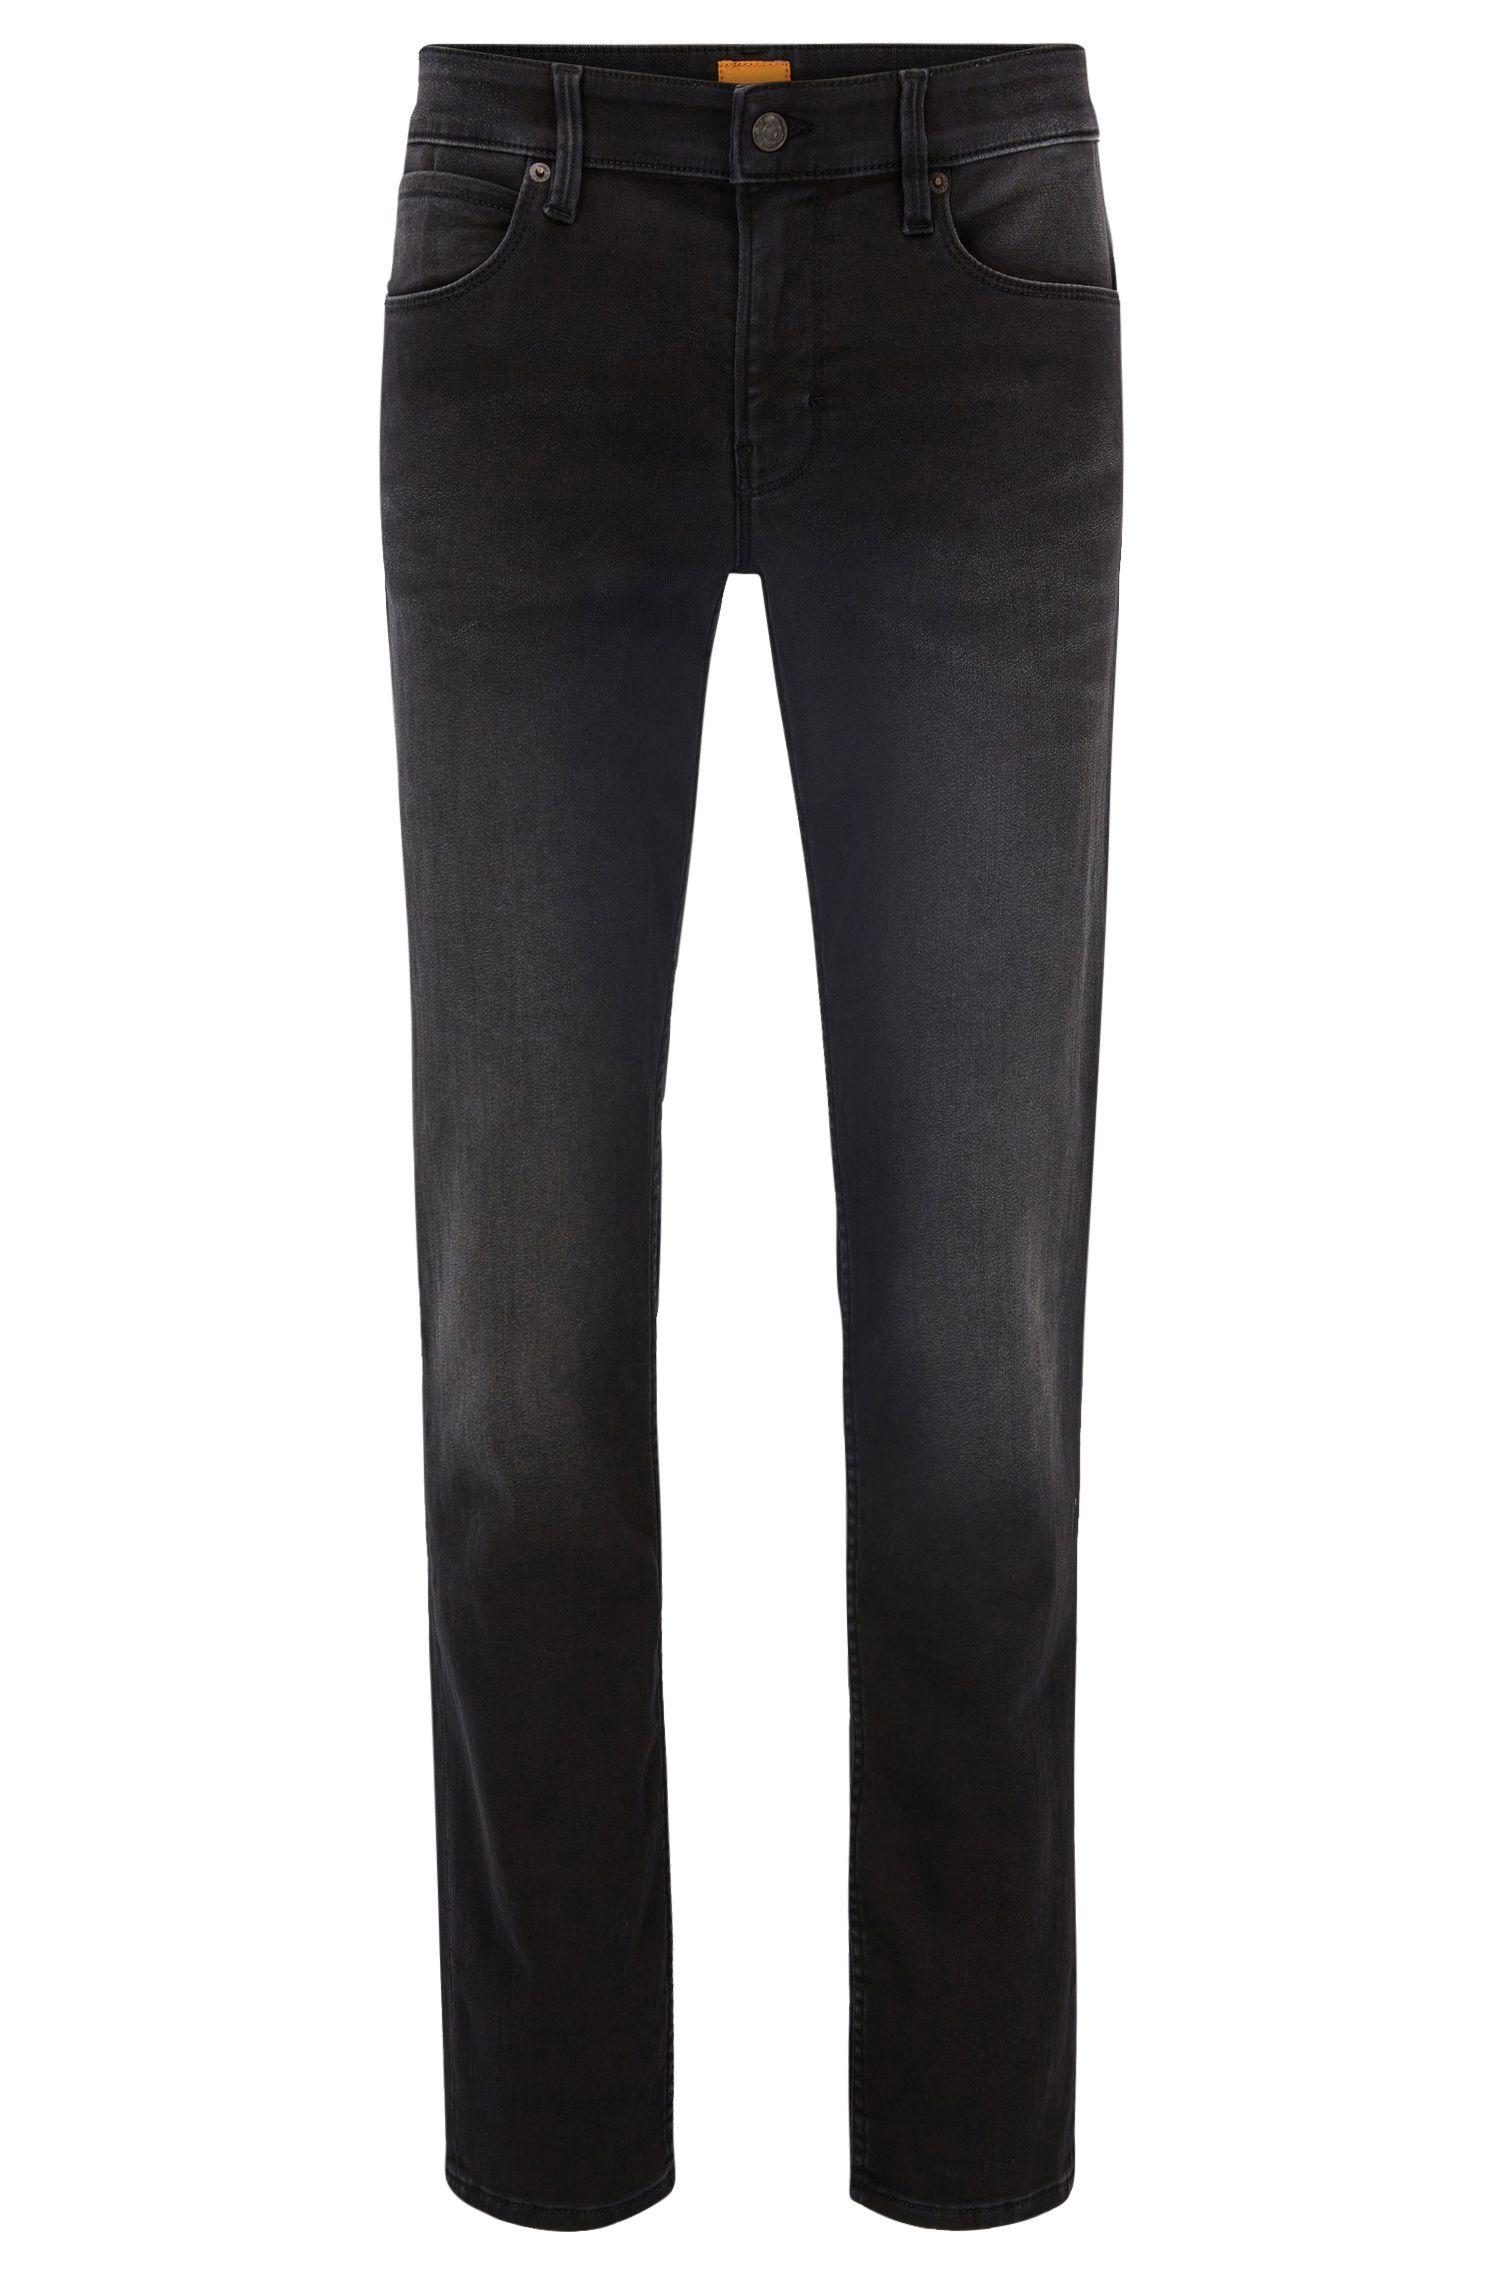 9.5 oz Stretch Cotton Blend Jeans, Slim Fit | Orange 63